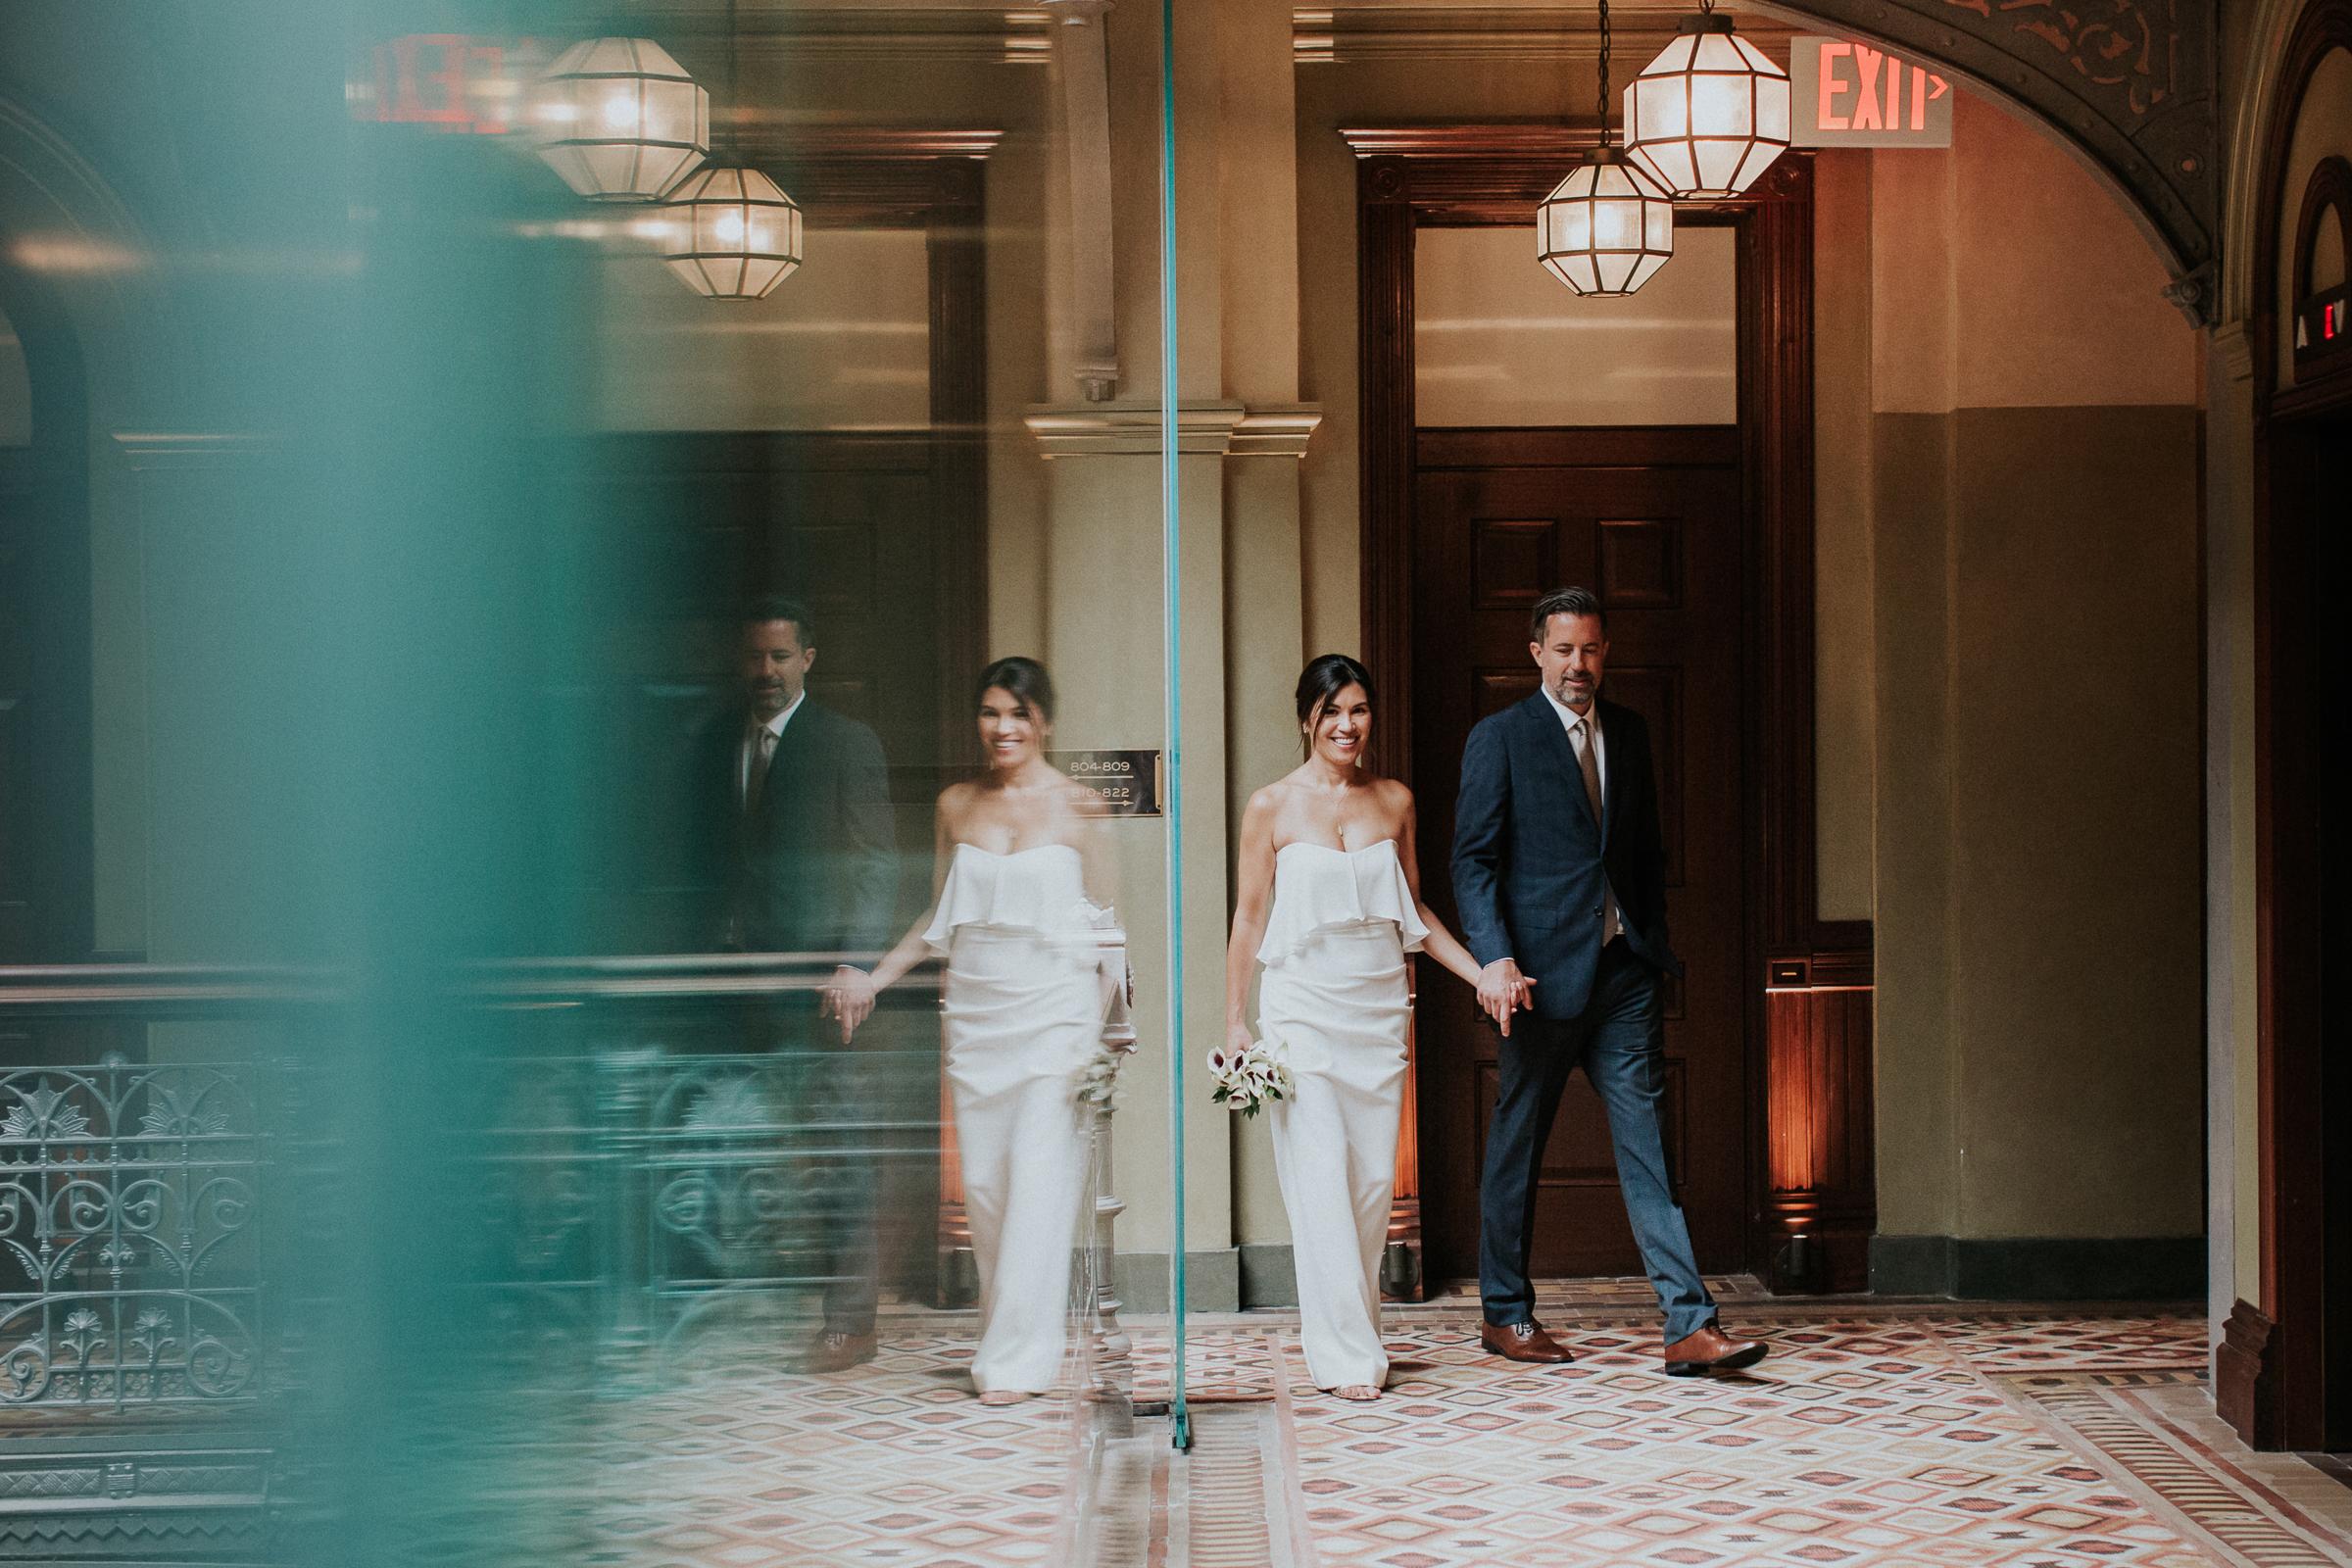 New-York-Documentary-Wedding-Photography-Best-Of-2017-by-Elvira-Kalviste-Photography-52.jpg